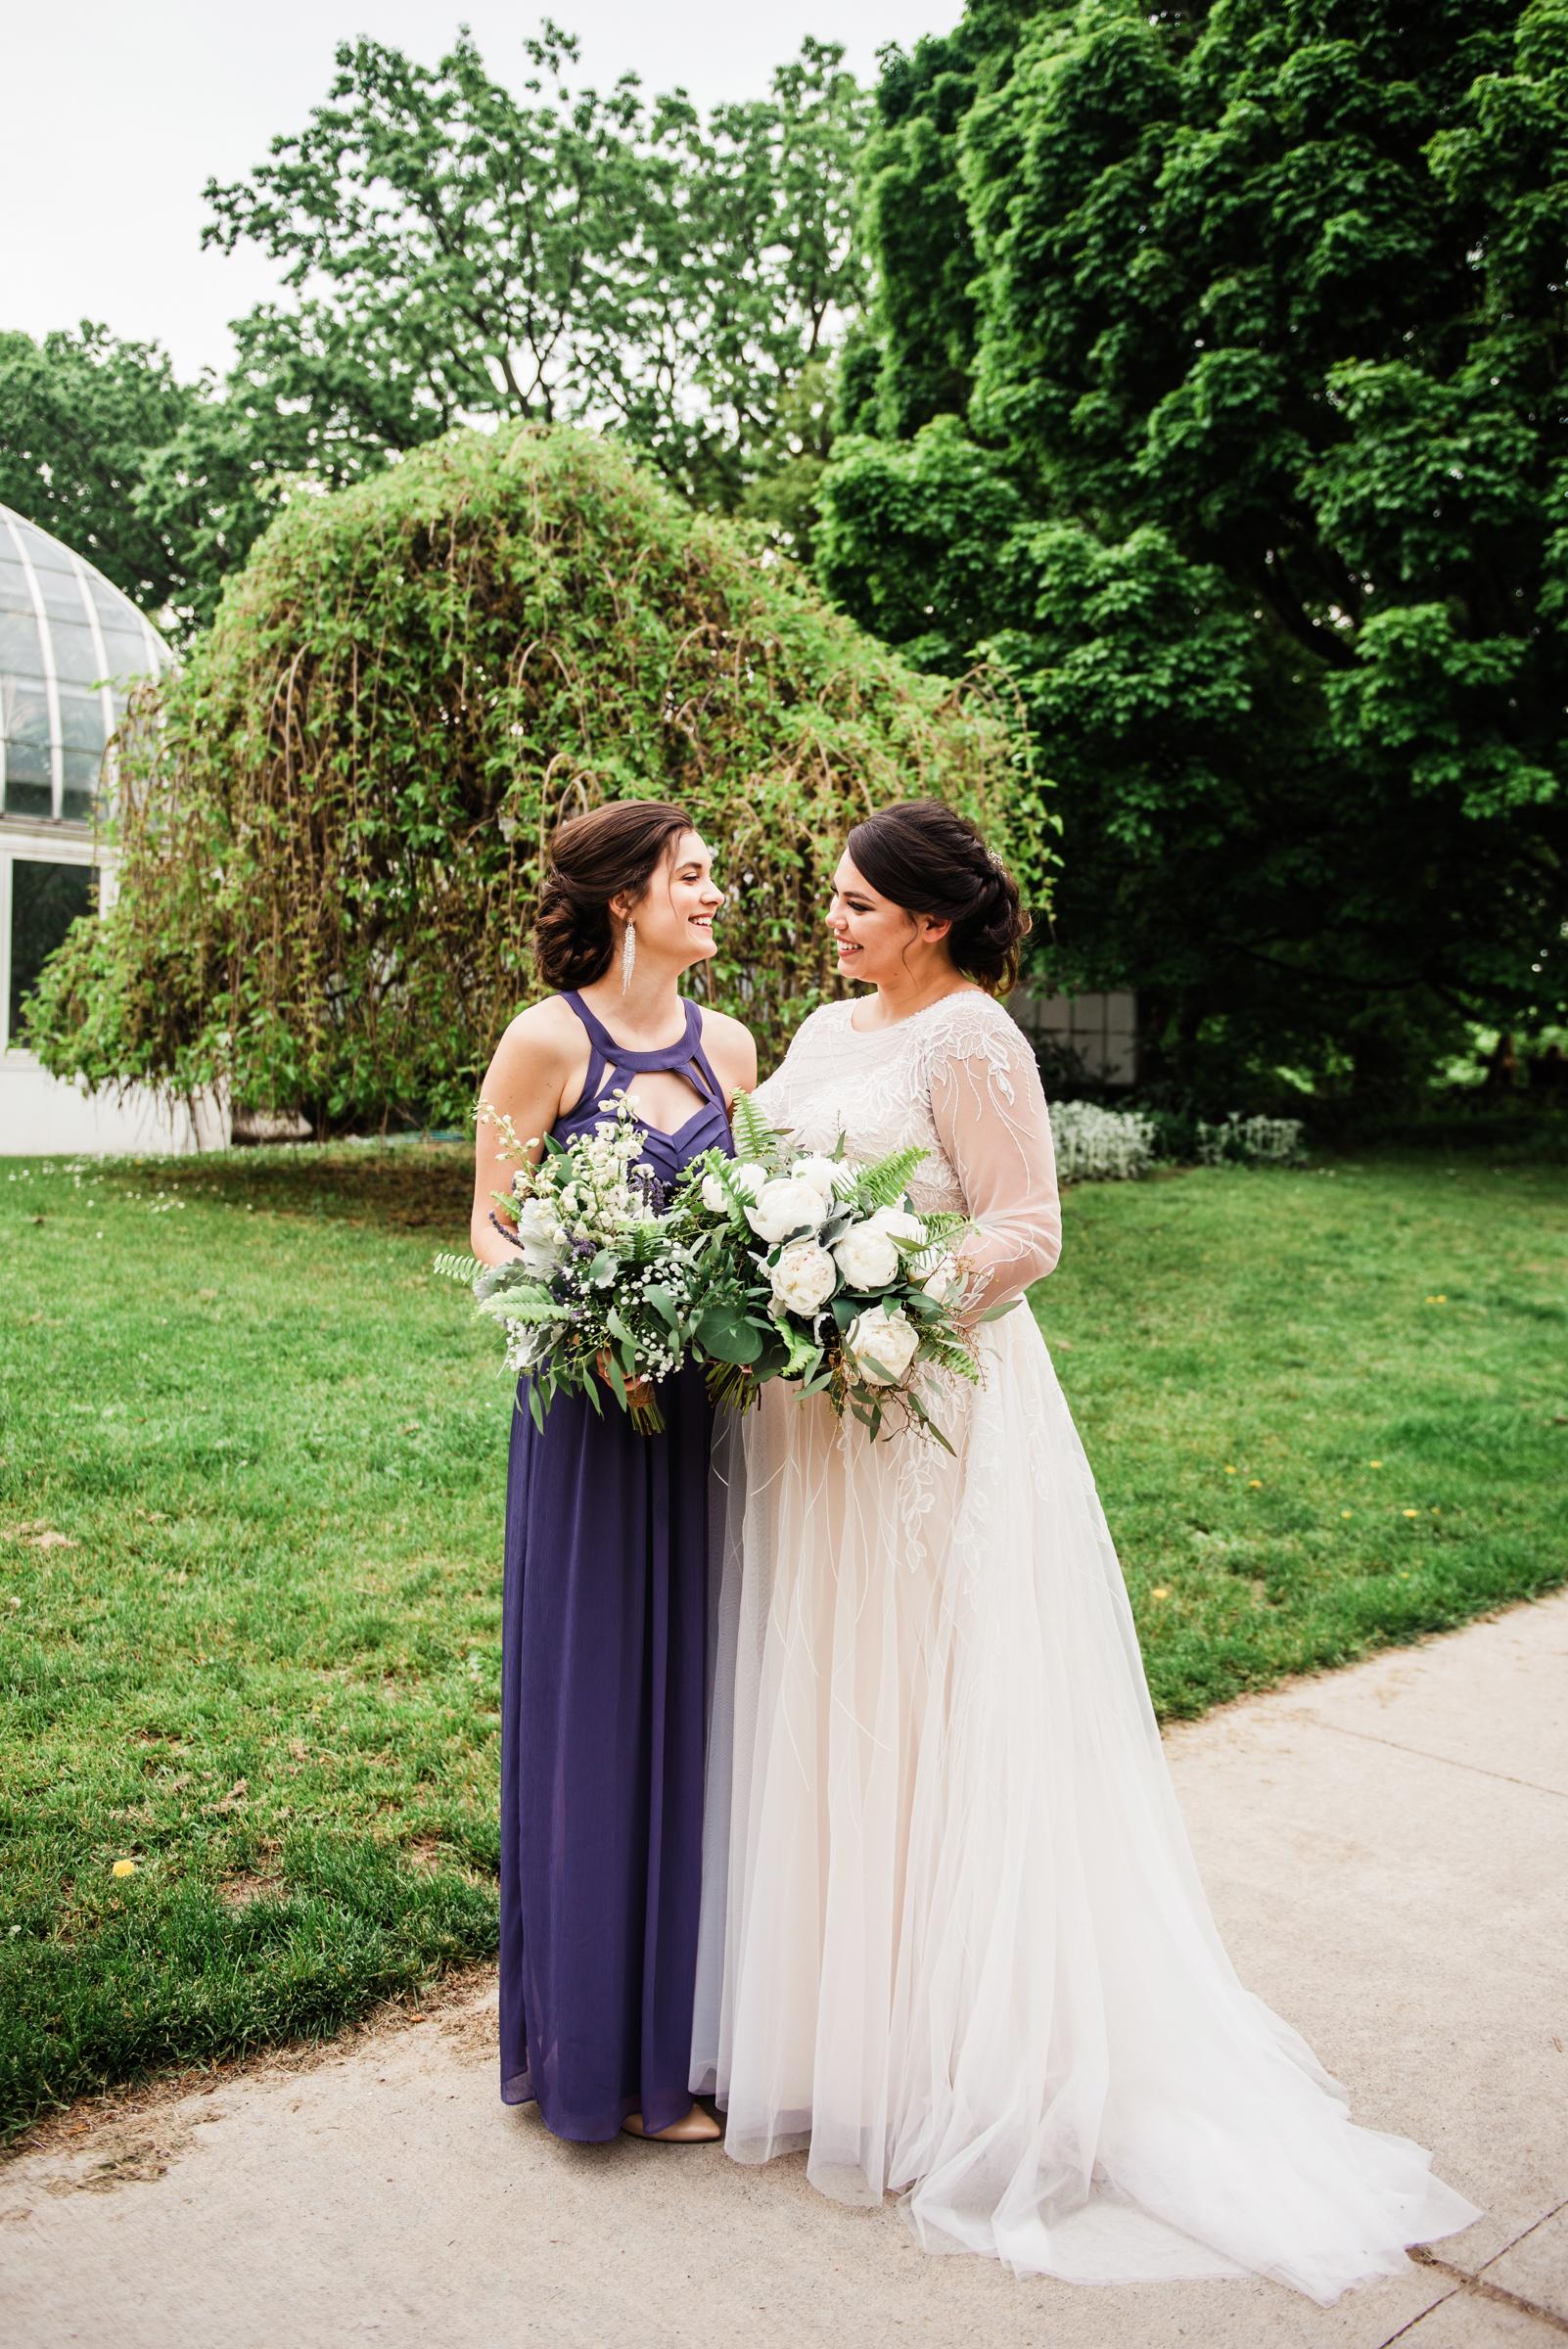 Studio_180_Lamberton_Conservatory_Rochester_Wedding_JILL_STUDIO_Rochester_NY_Photographer_DSC_8728.jpg